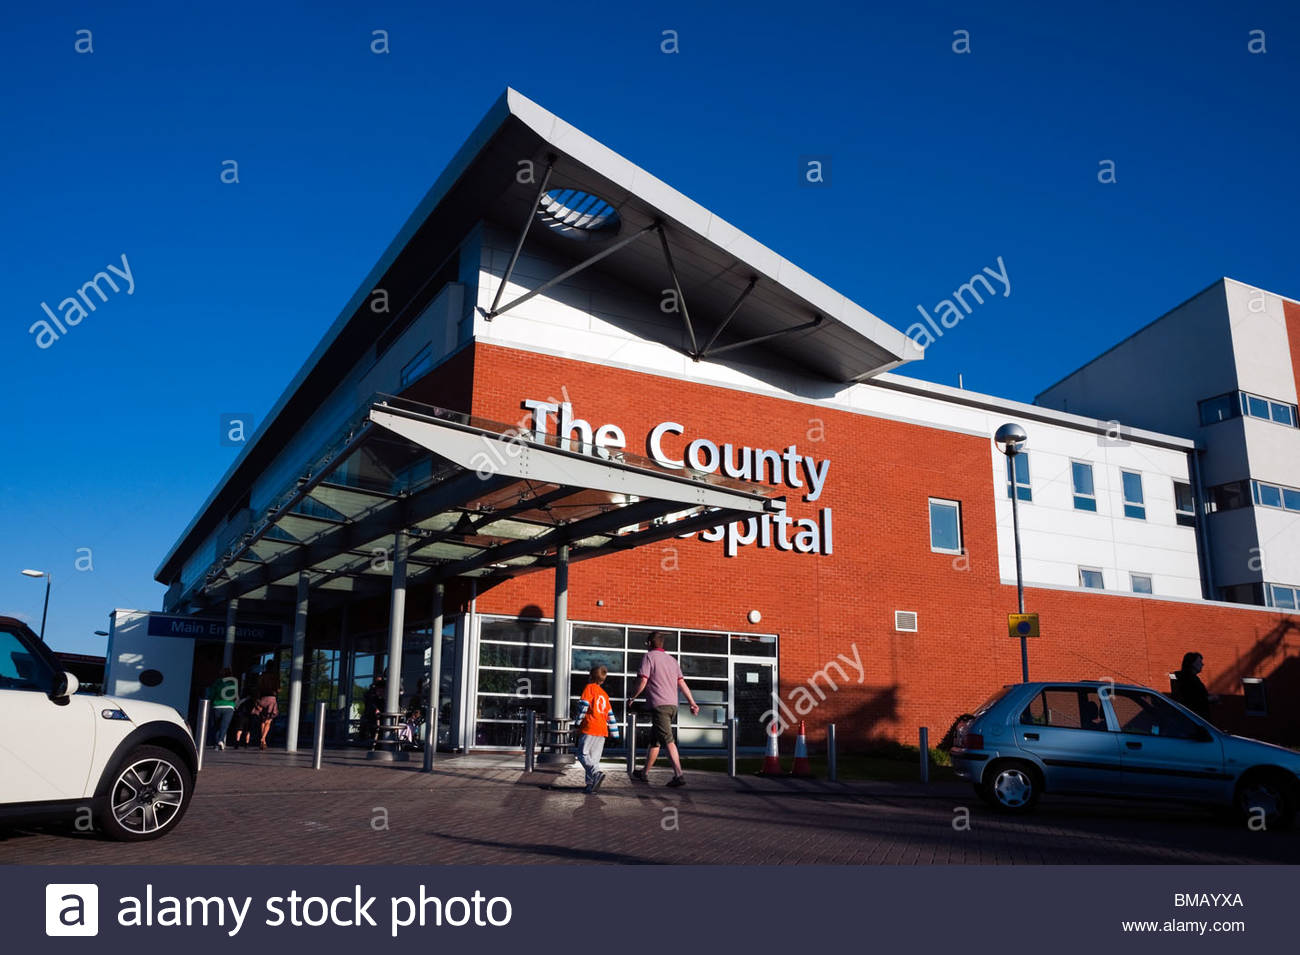 L'Hôpital du comté, Hereford, Herefordshire, Angleterre. Photo Stock